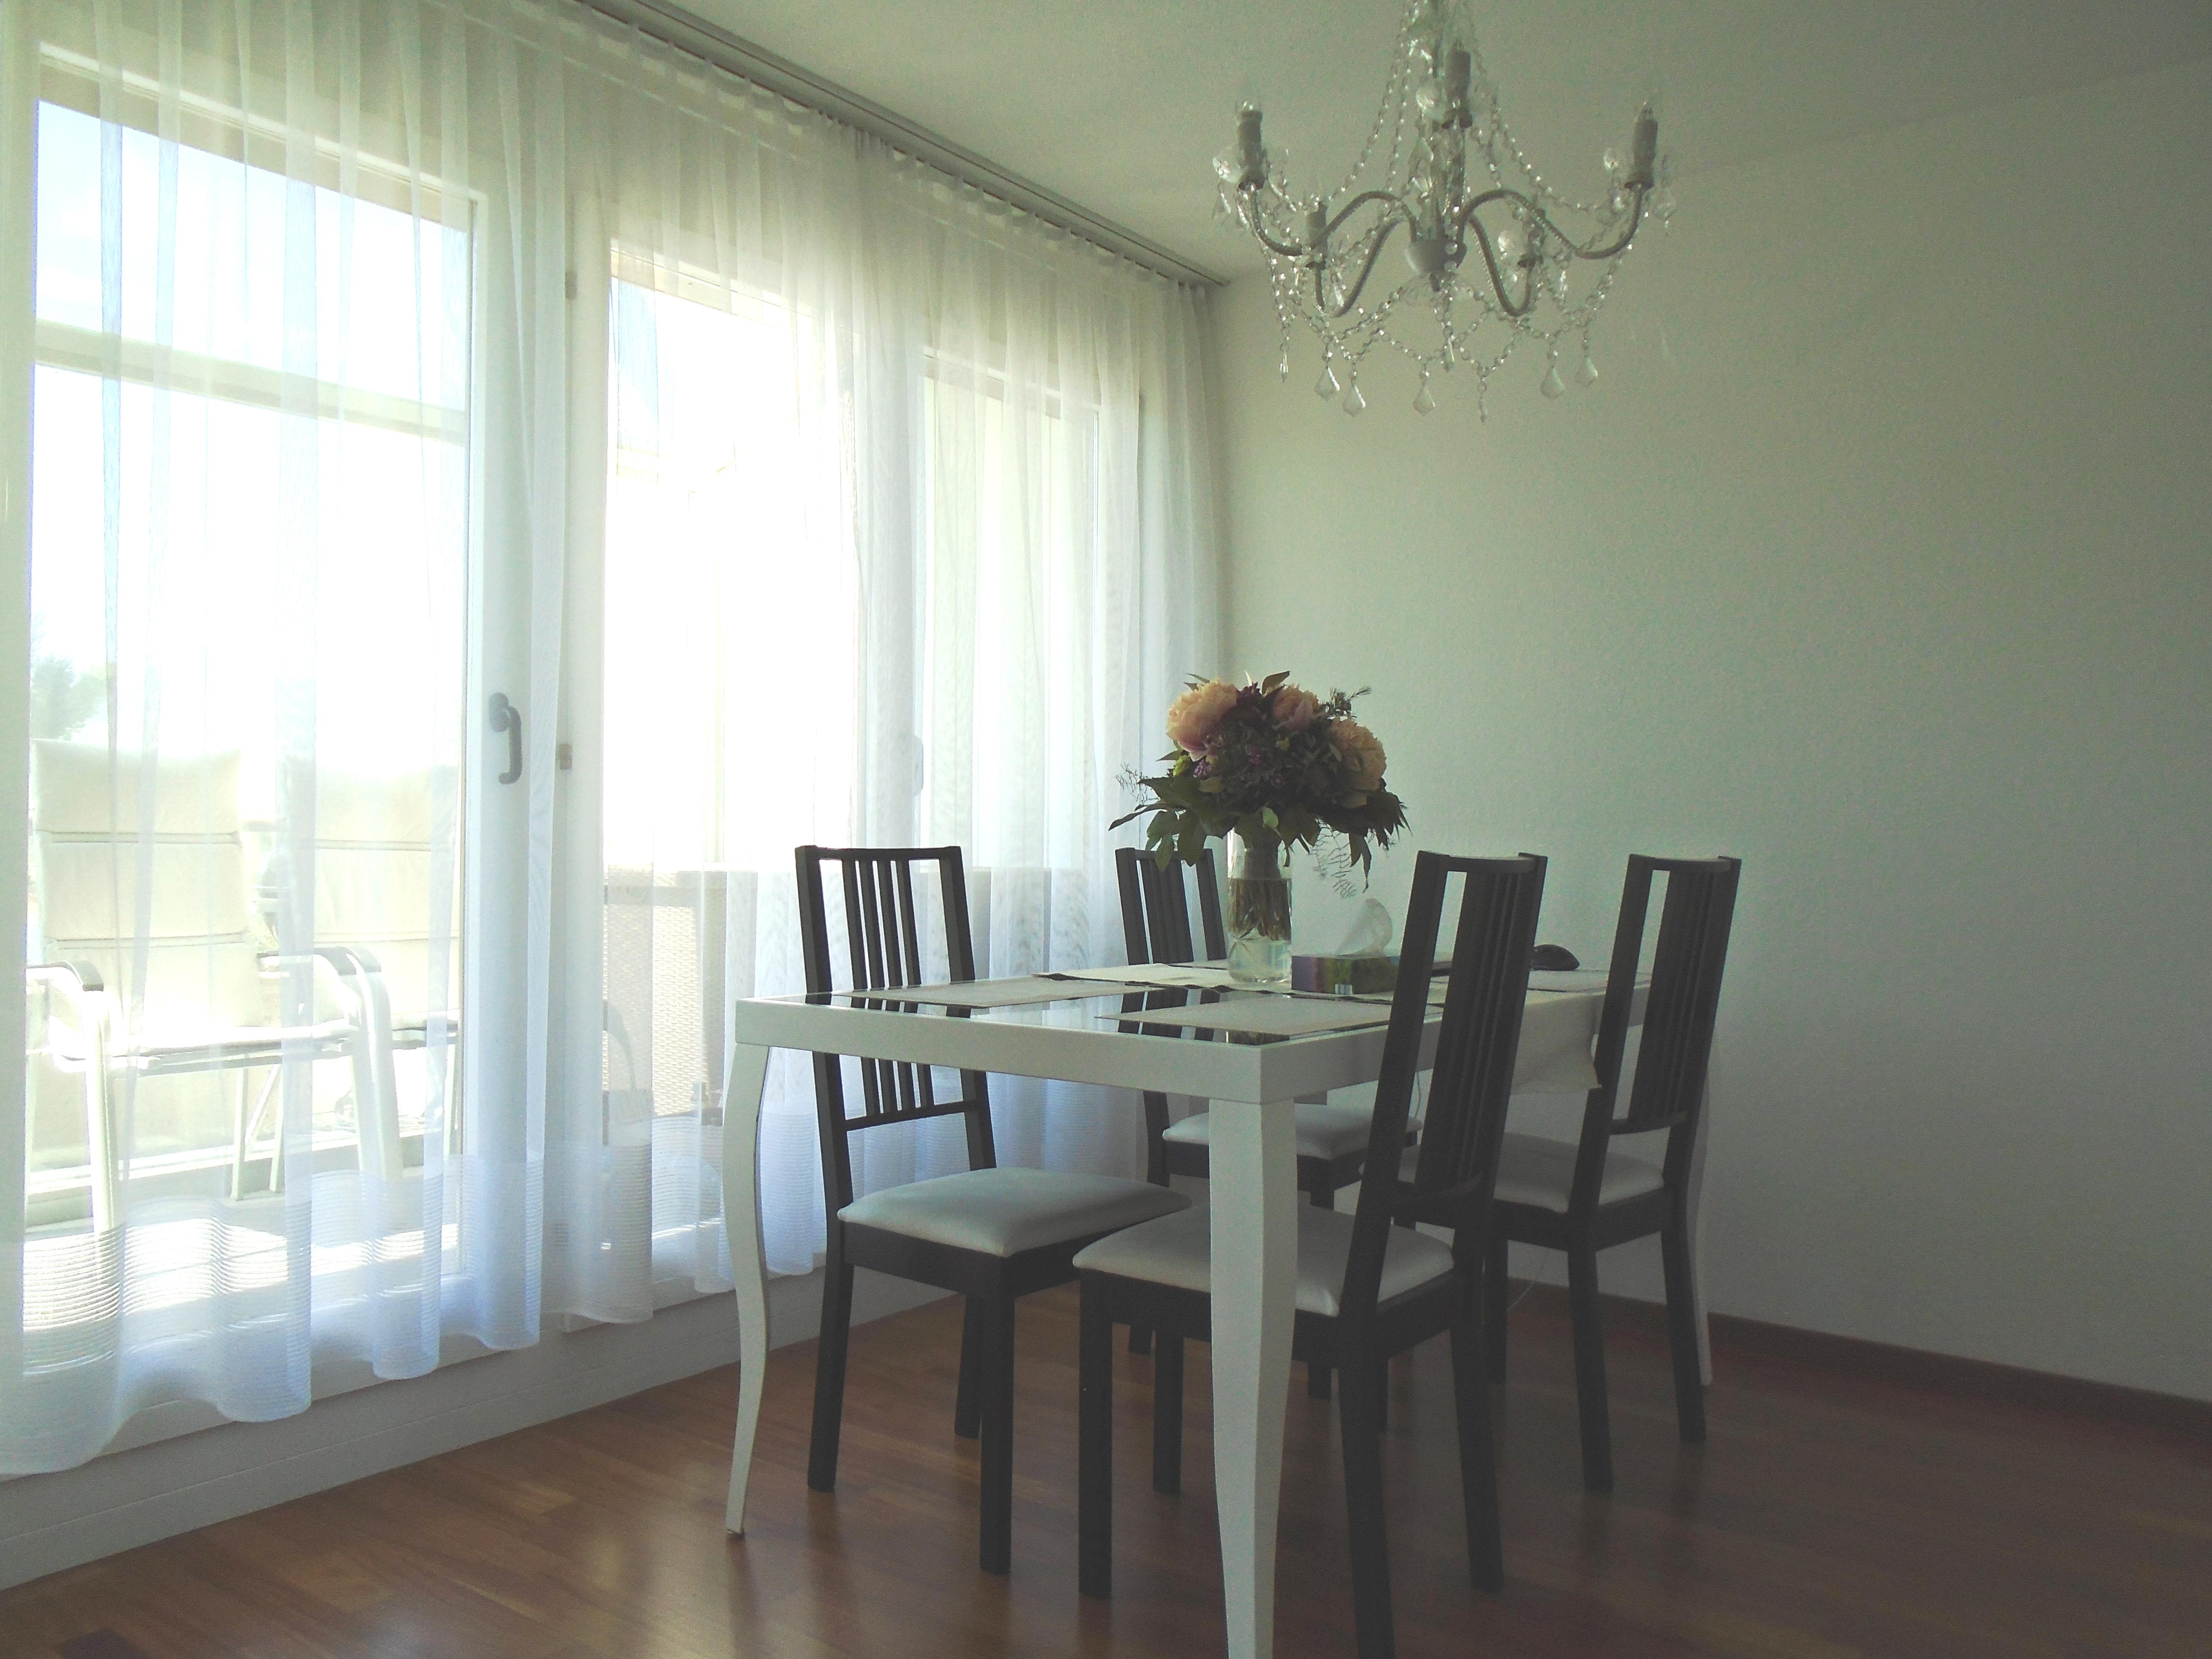 Kaufobjekt: Wohnung im �berbauung Buechlipark